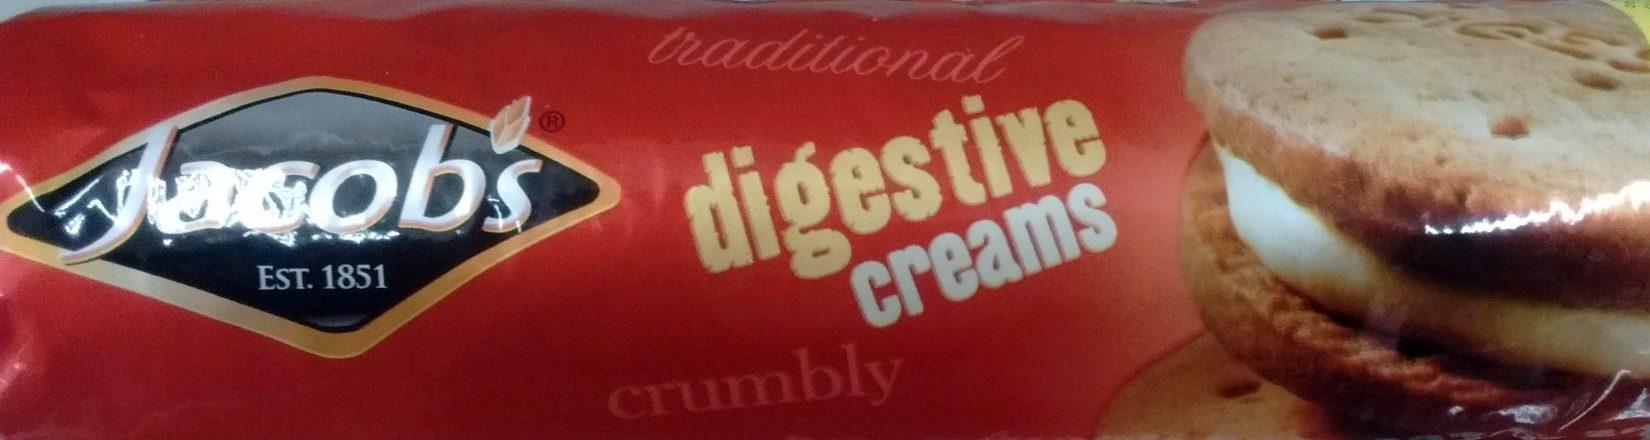 Digestive Creams - Product